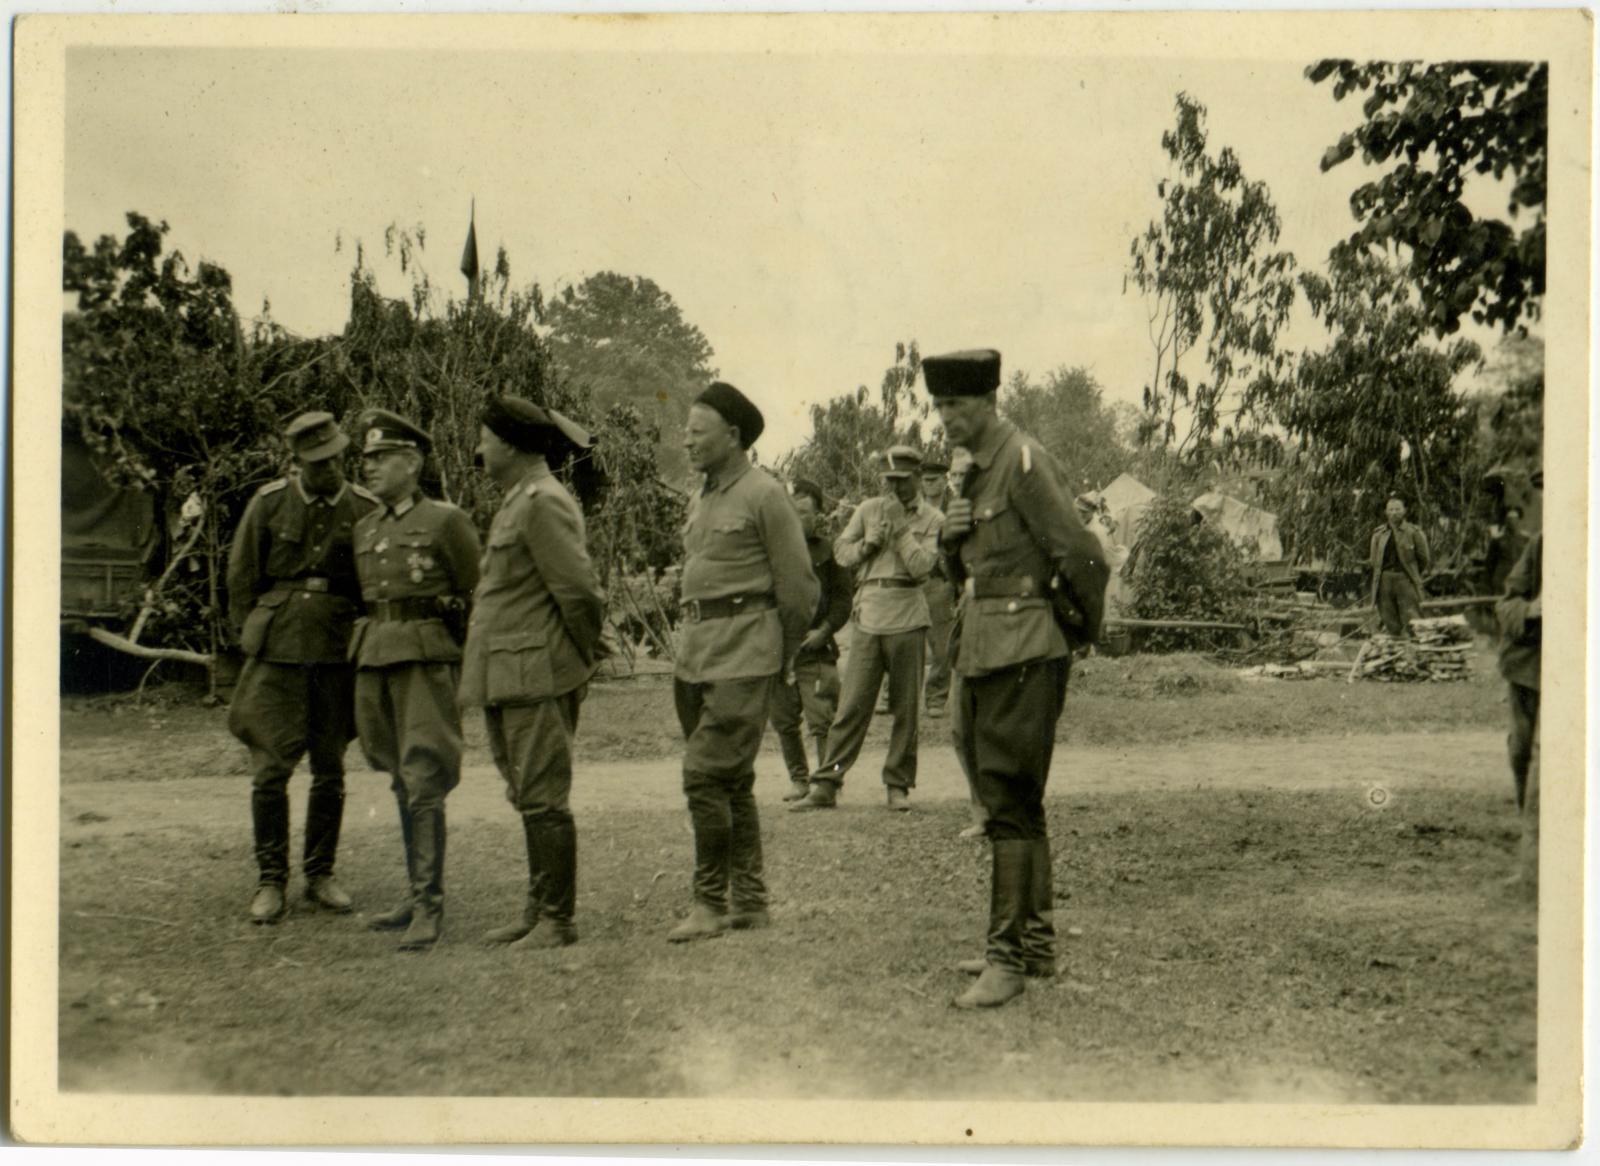 Казачий стан. Район Барановичи — Слоним. 1944